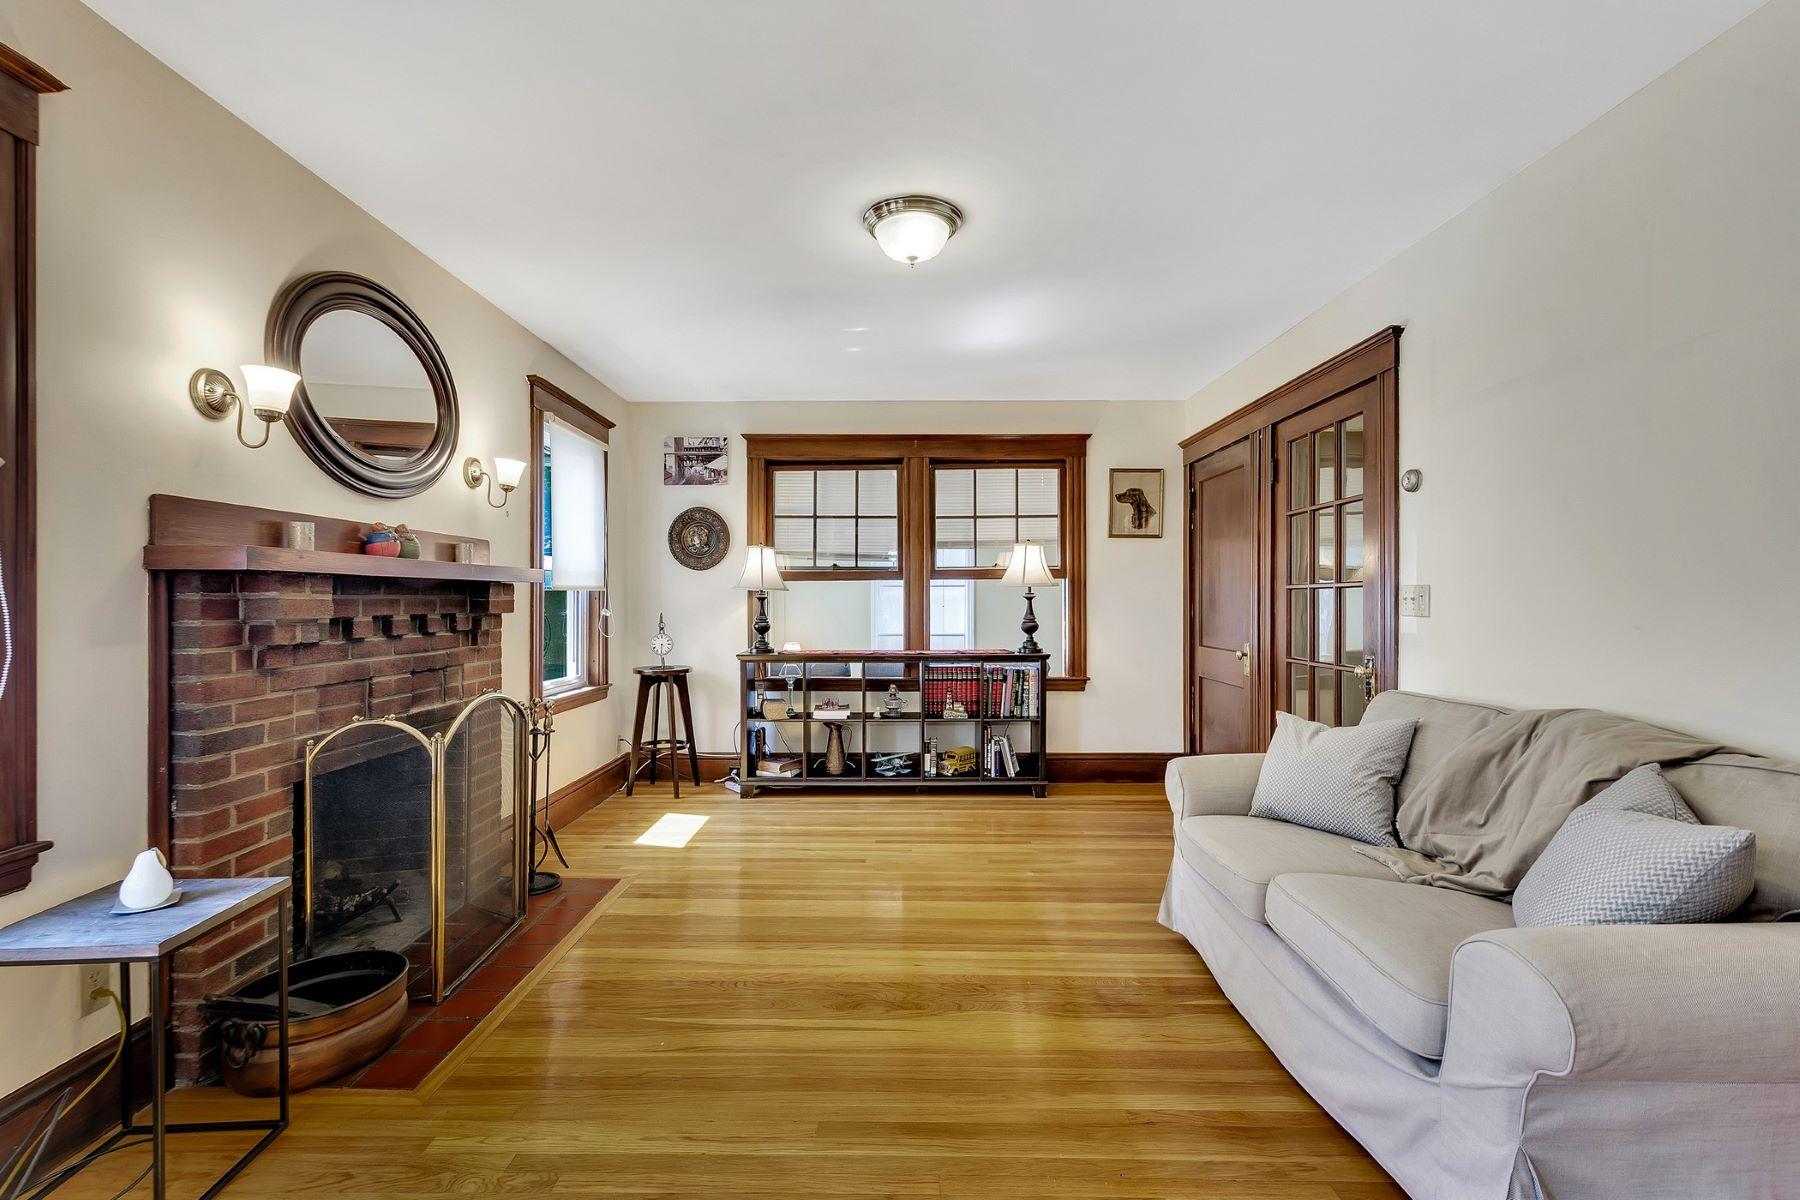 Other Residential Homes 为 销售 在 15 Bartlett Ave 15, 贝尔蒙, 马萨诸塞州 02478 美国